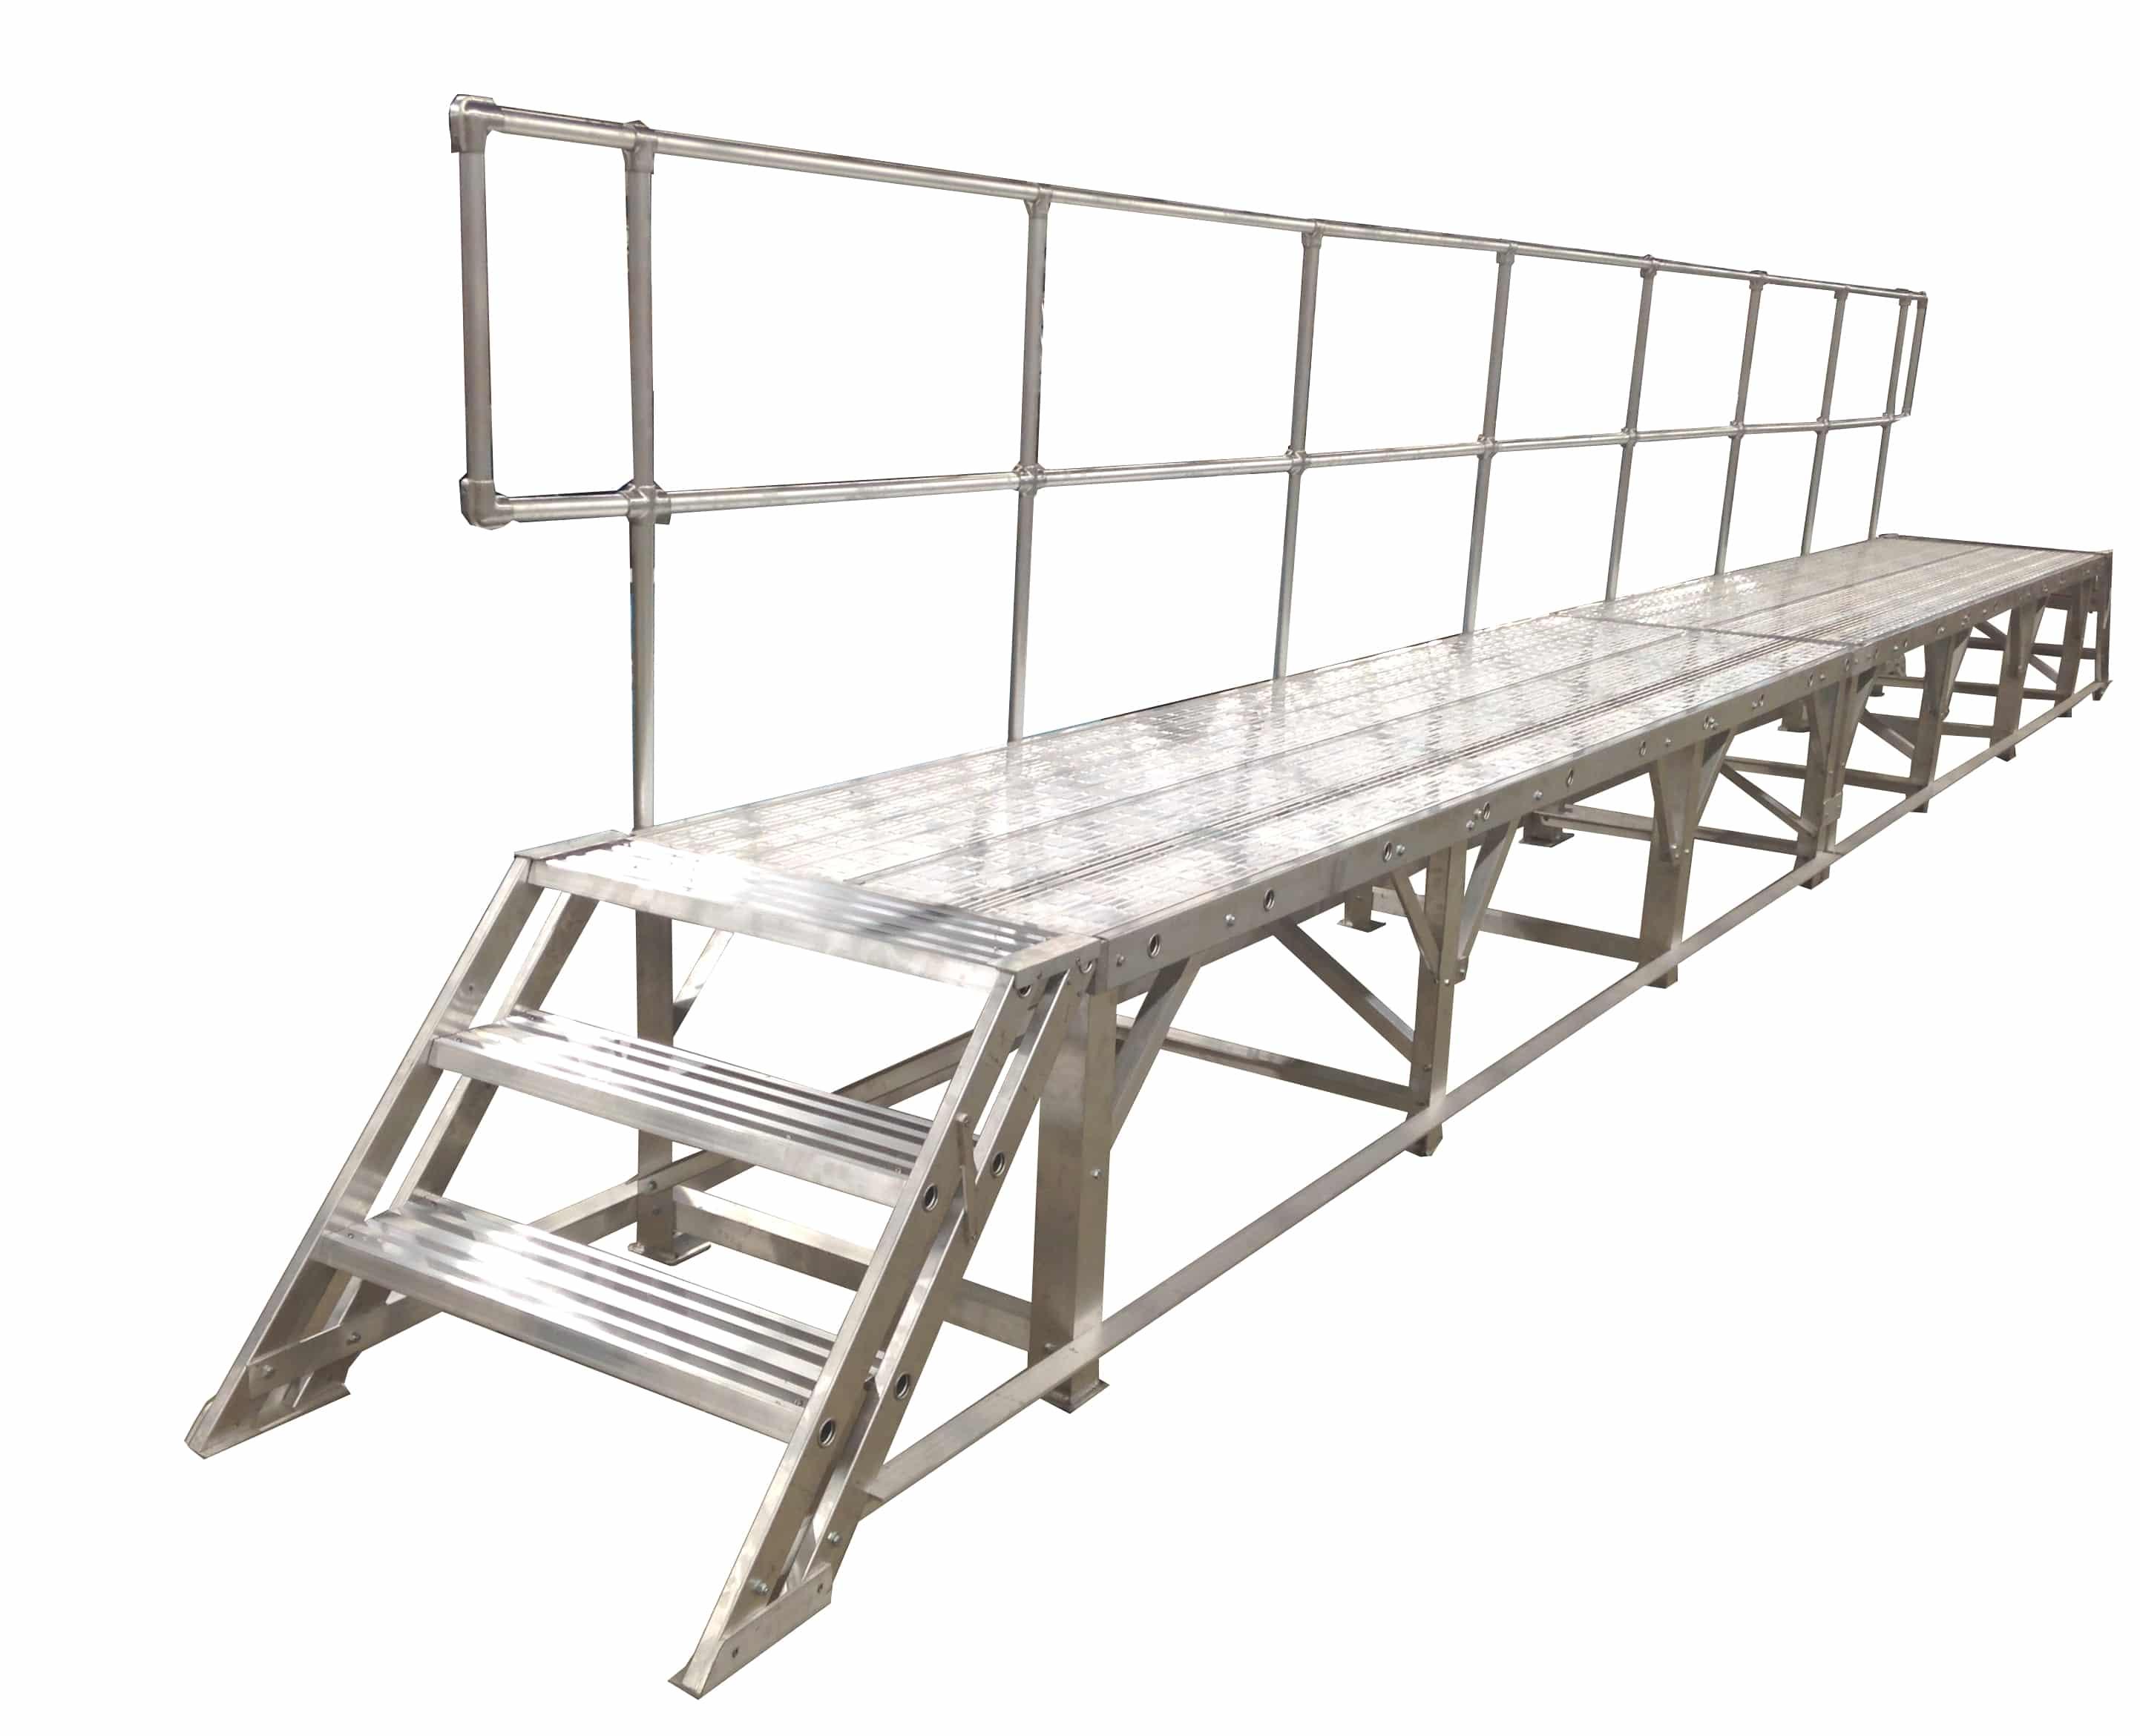 Stationary Work Platforms Metallic Ladder Mfg Corporation